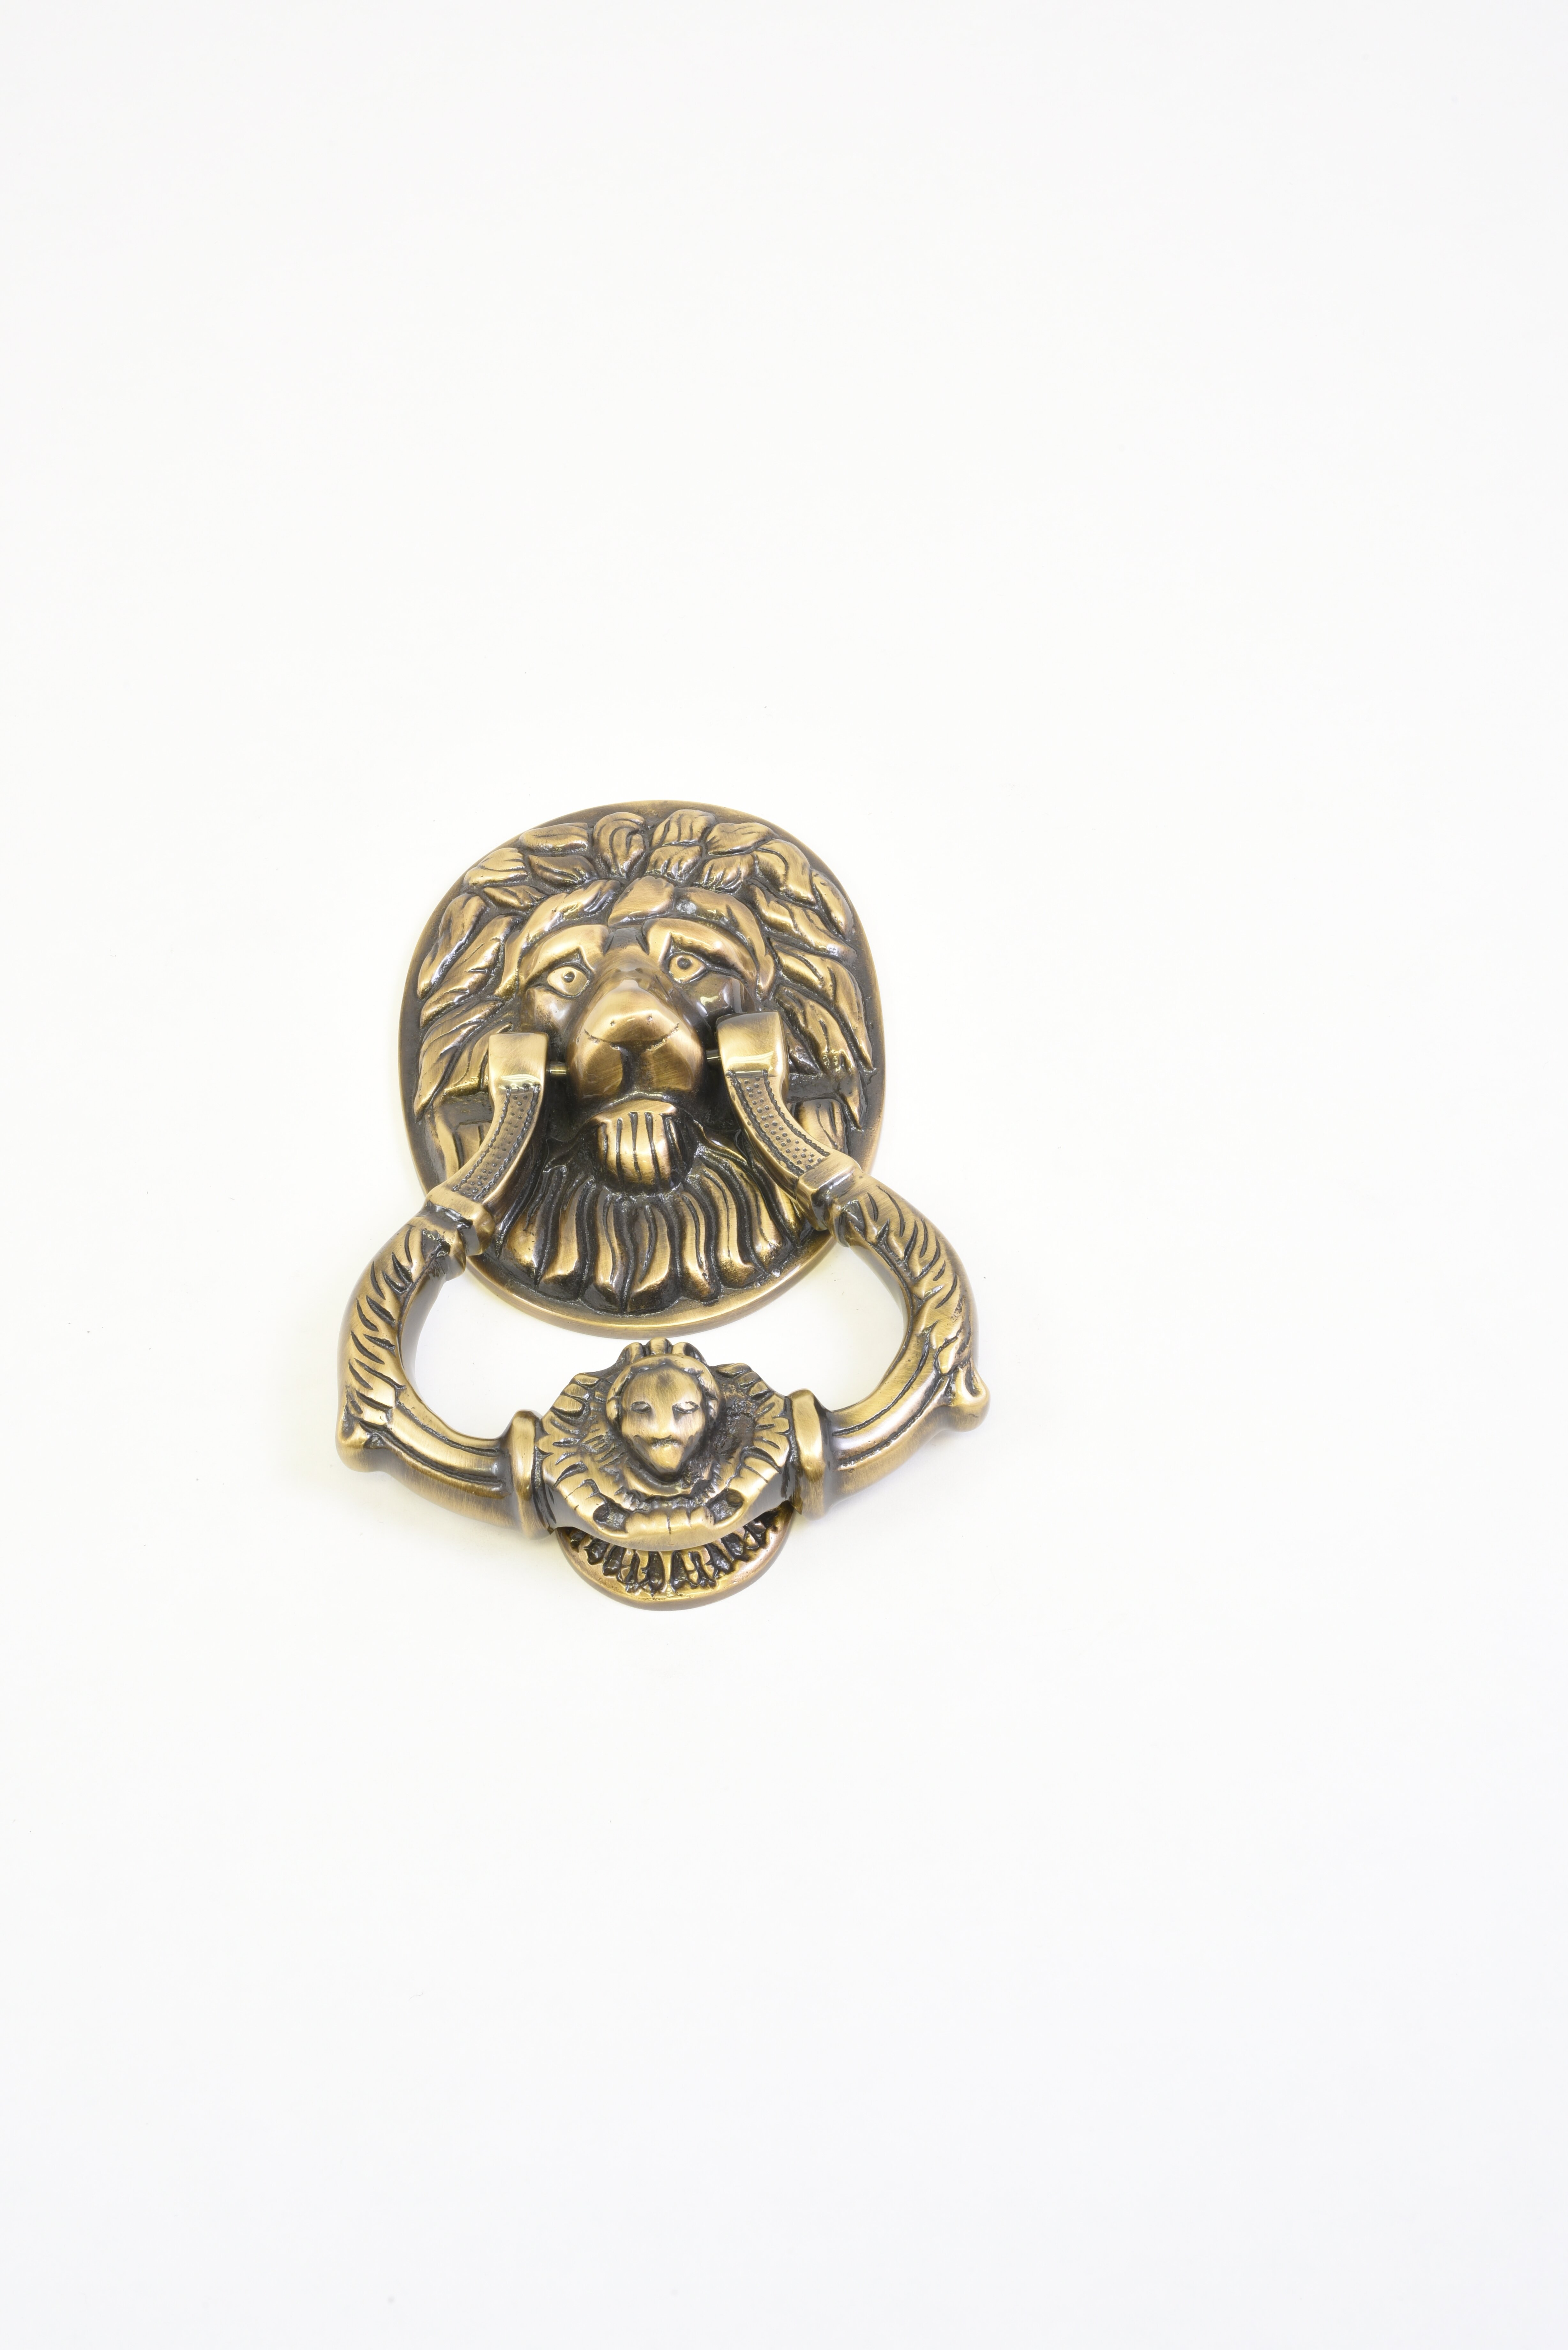 Polished Brass Casa Hardware Small Brass Lion Door Knocker